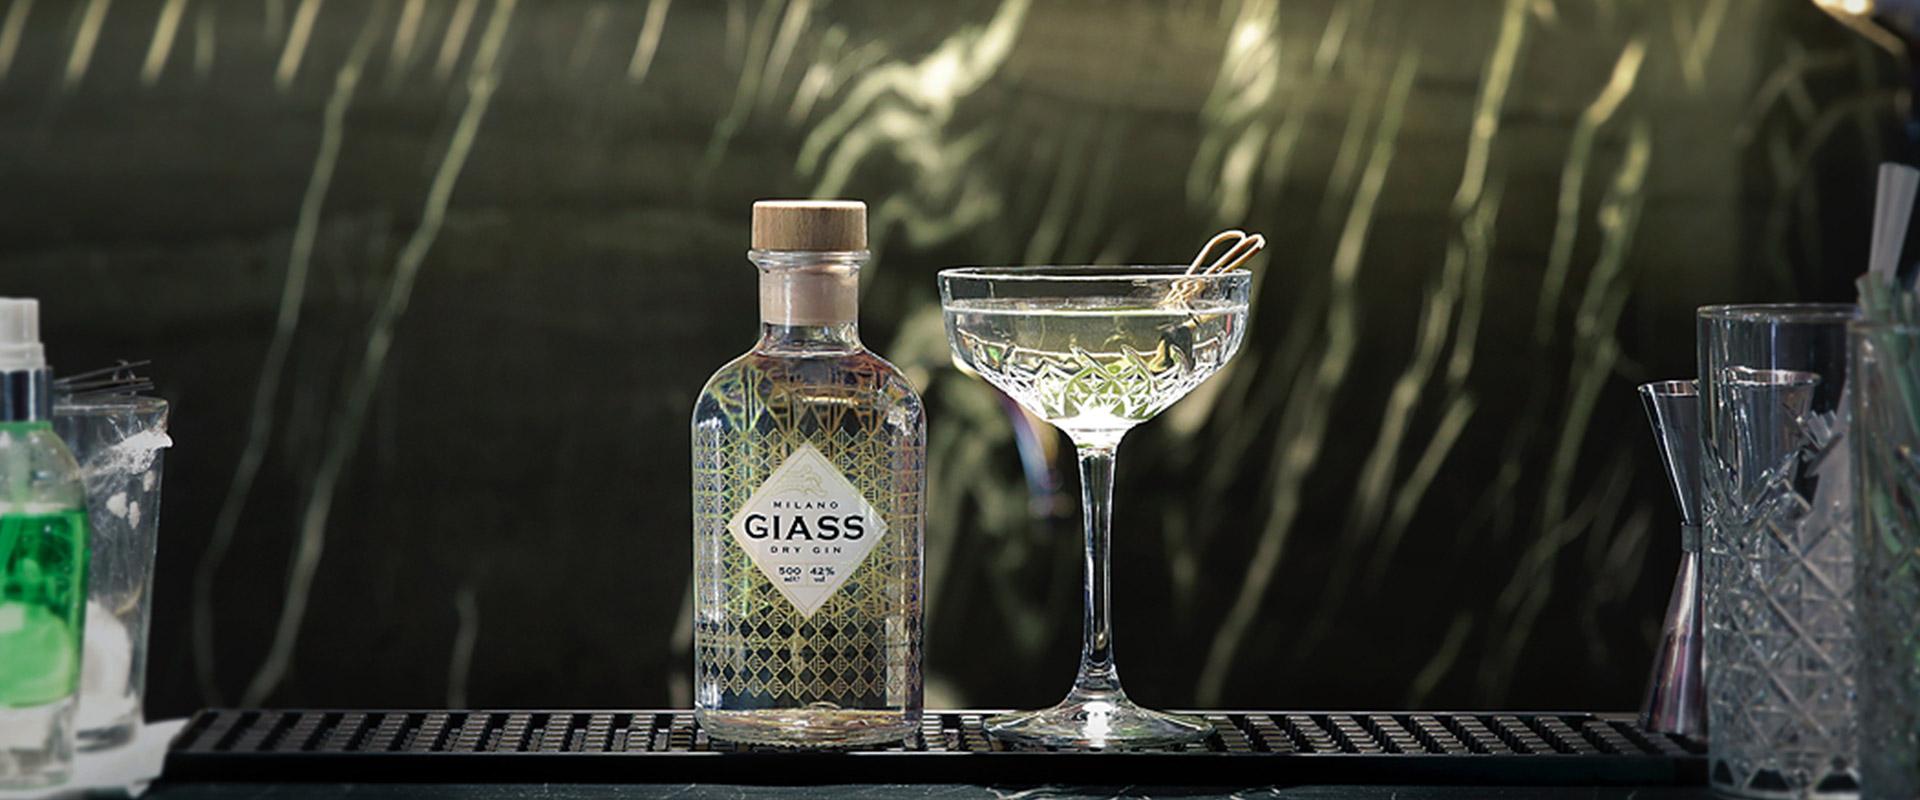 Giass – Milano Dry Gin: eleganza in bottiglia